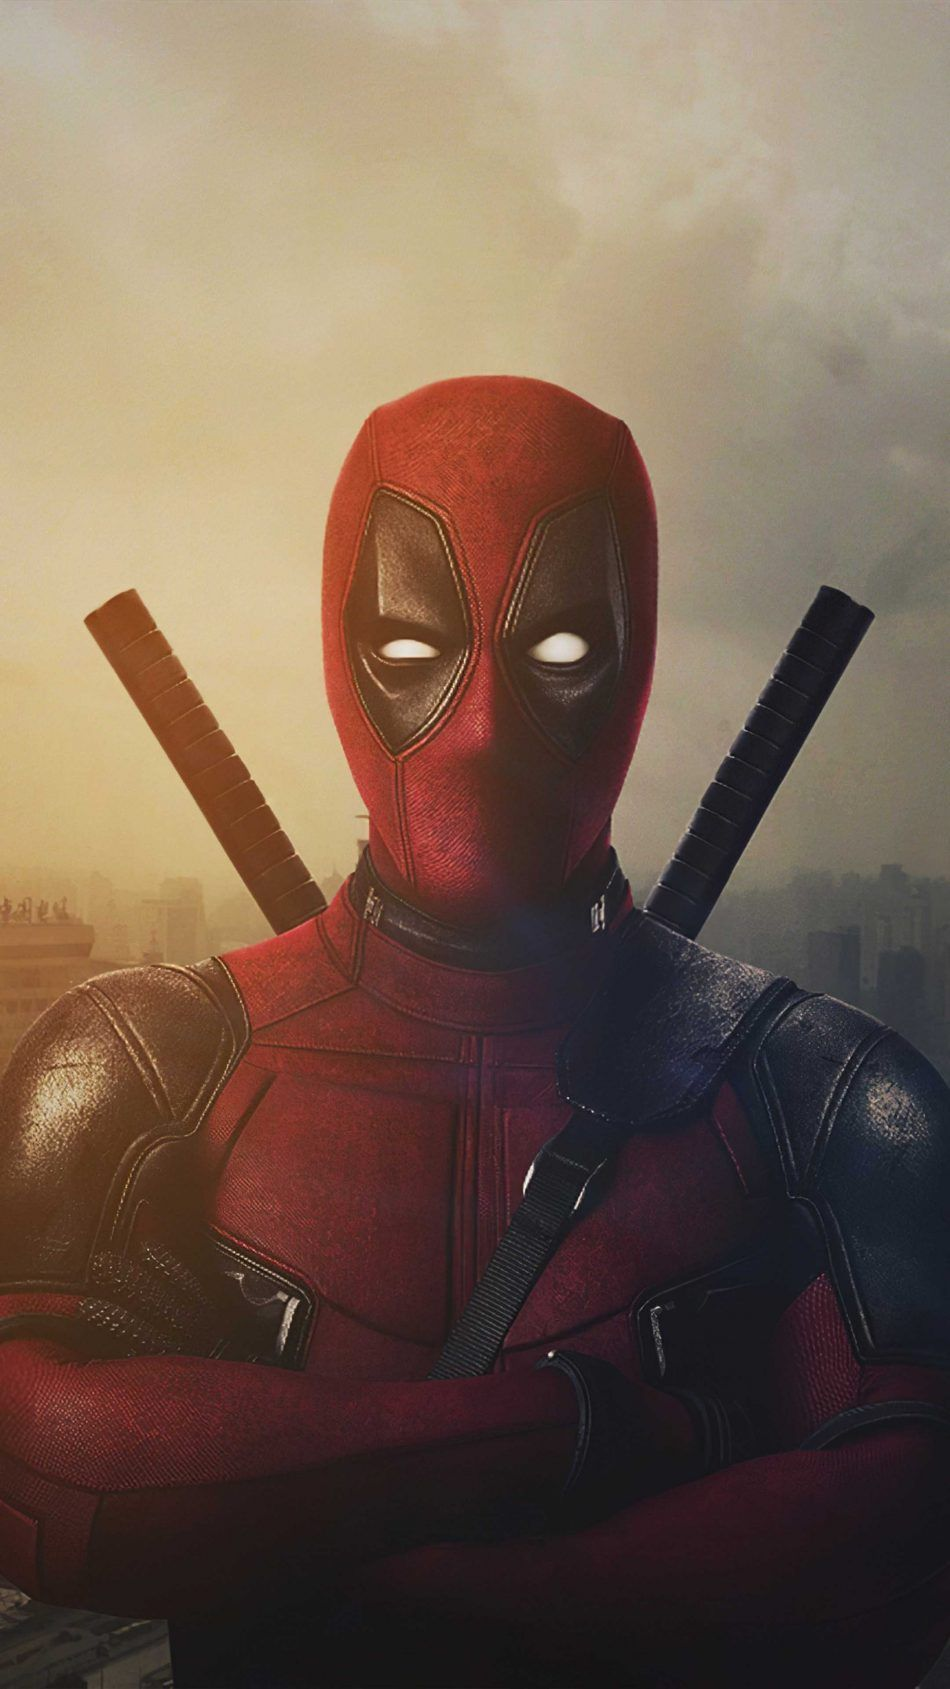 Superhero Deadpool 4k Ultra Hd Mobile Wallpaper In 2021 Superhero Wallpaper Deadpool Hd Wallpaper Marvel Wallpaper Hd